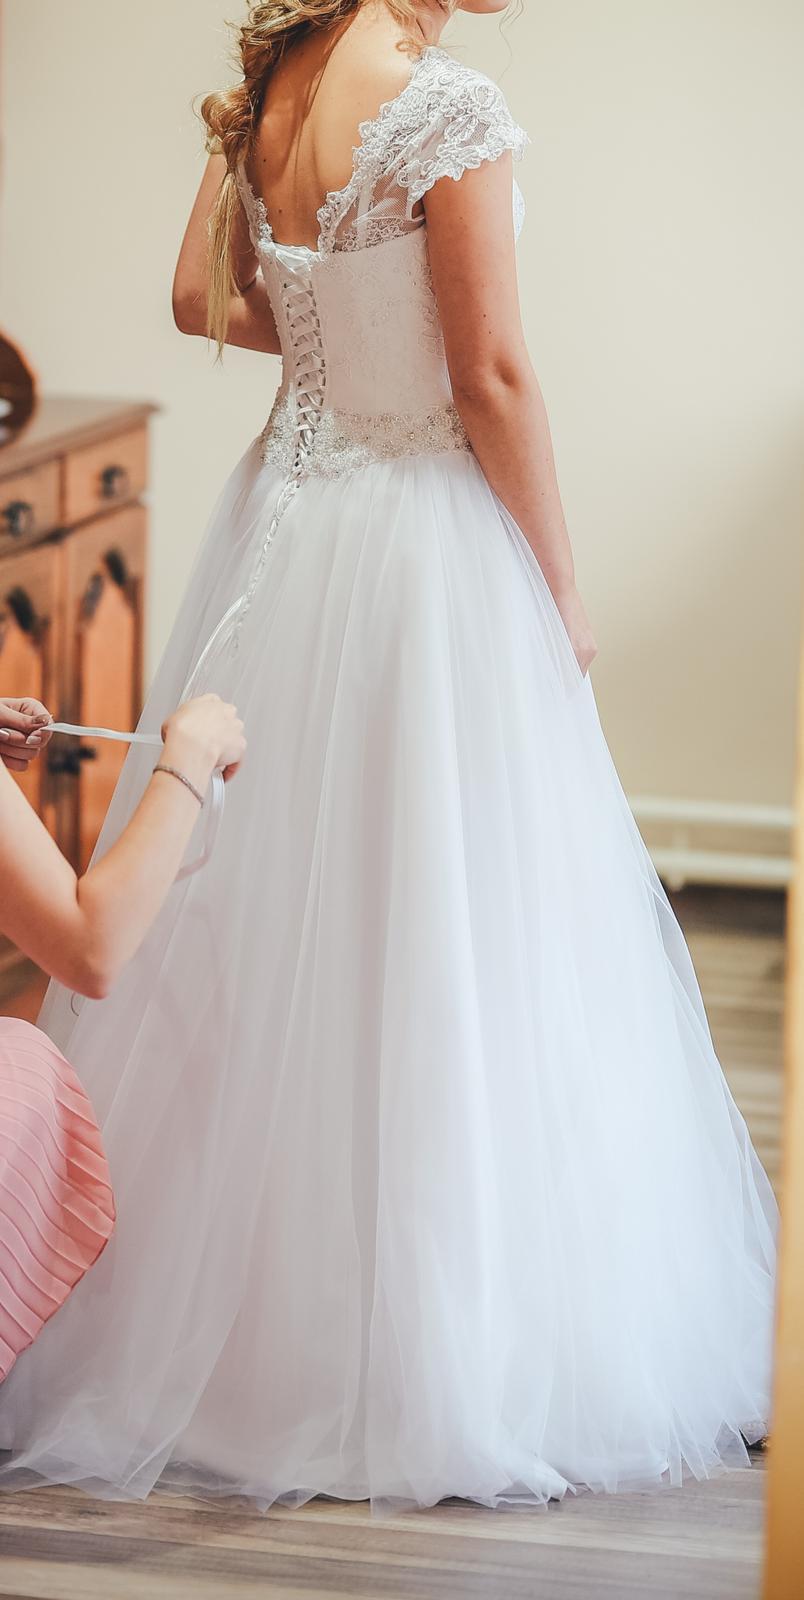 Emmi mariage svad. šaty - Obrázok č. 2